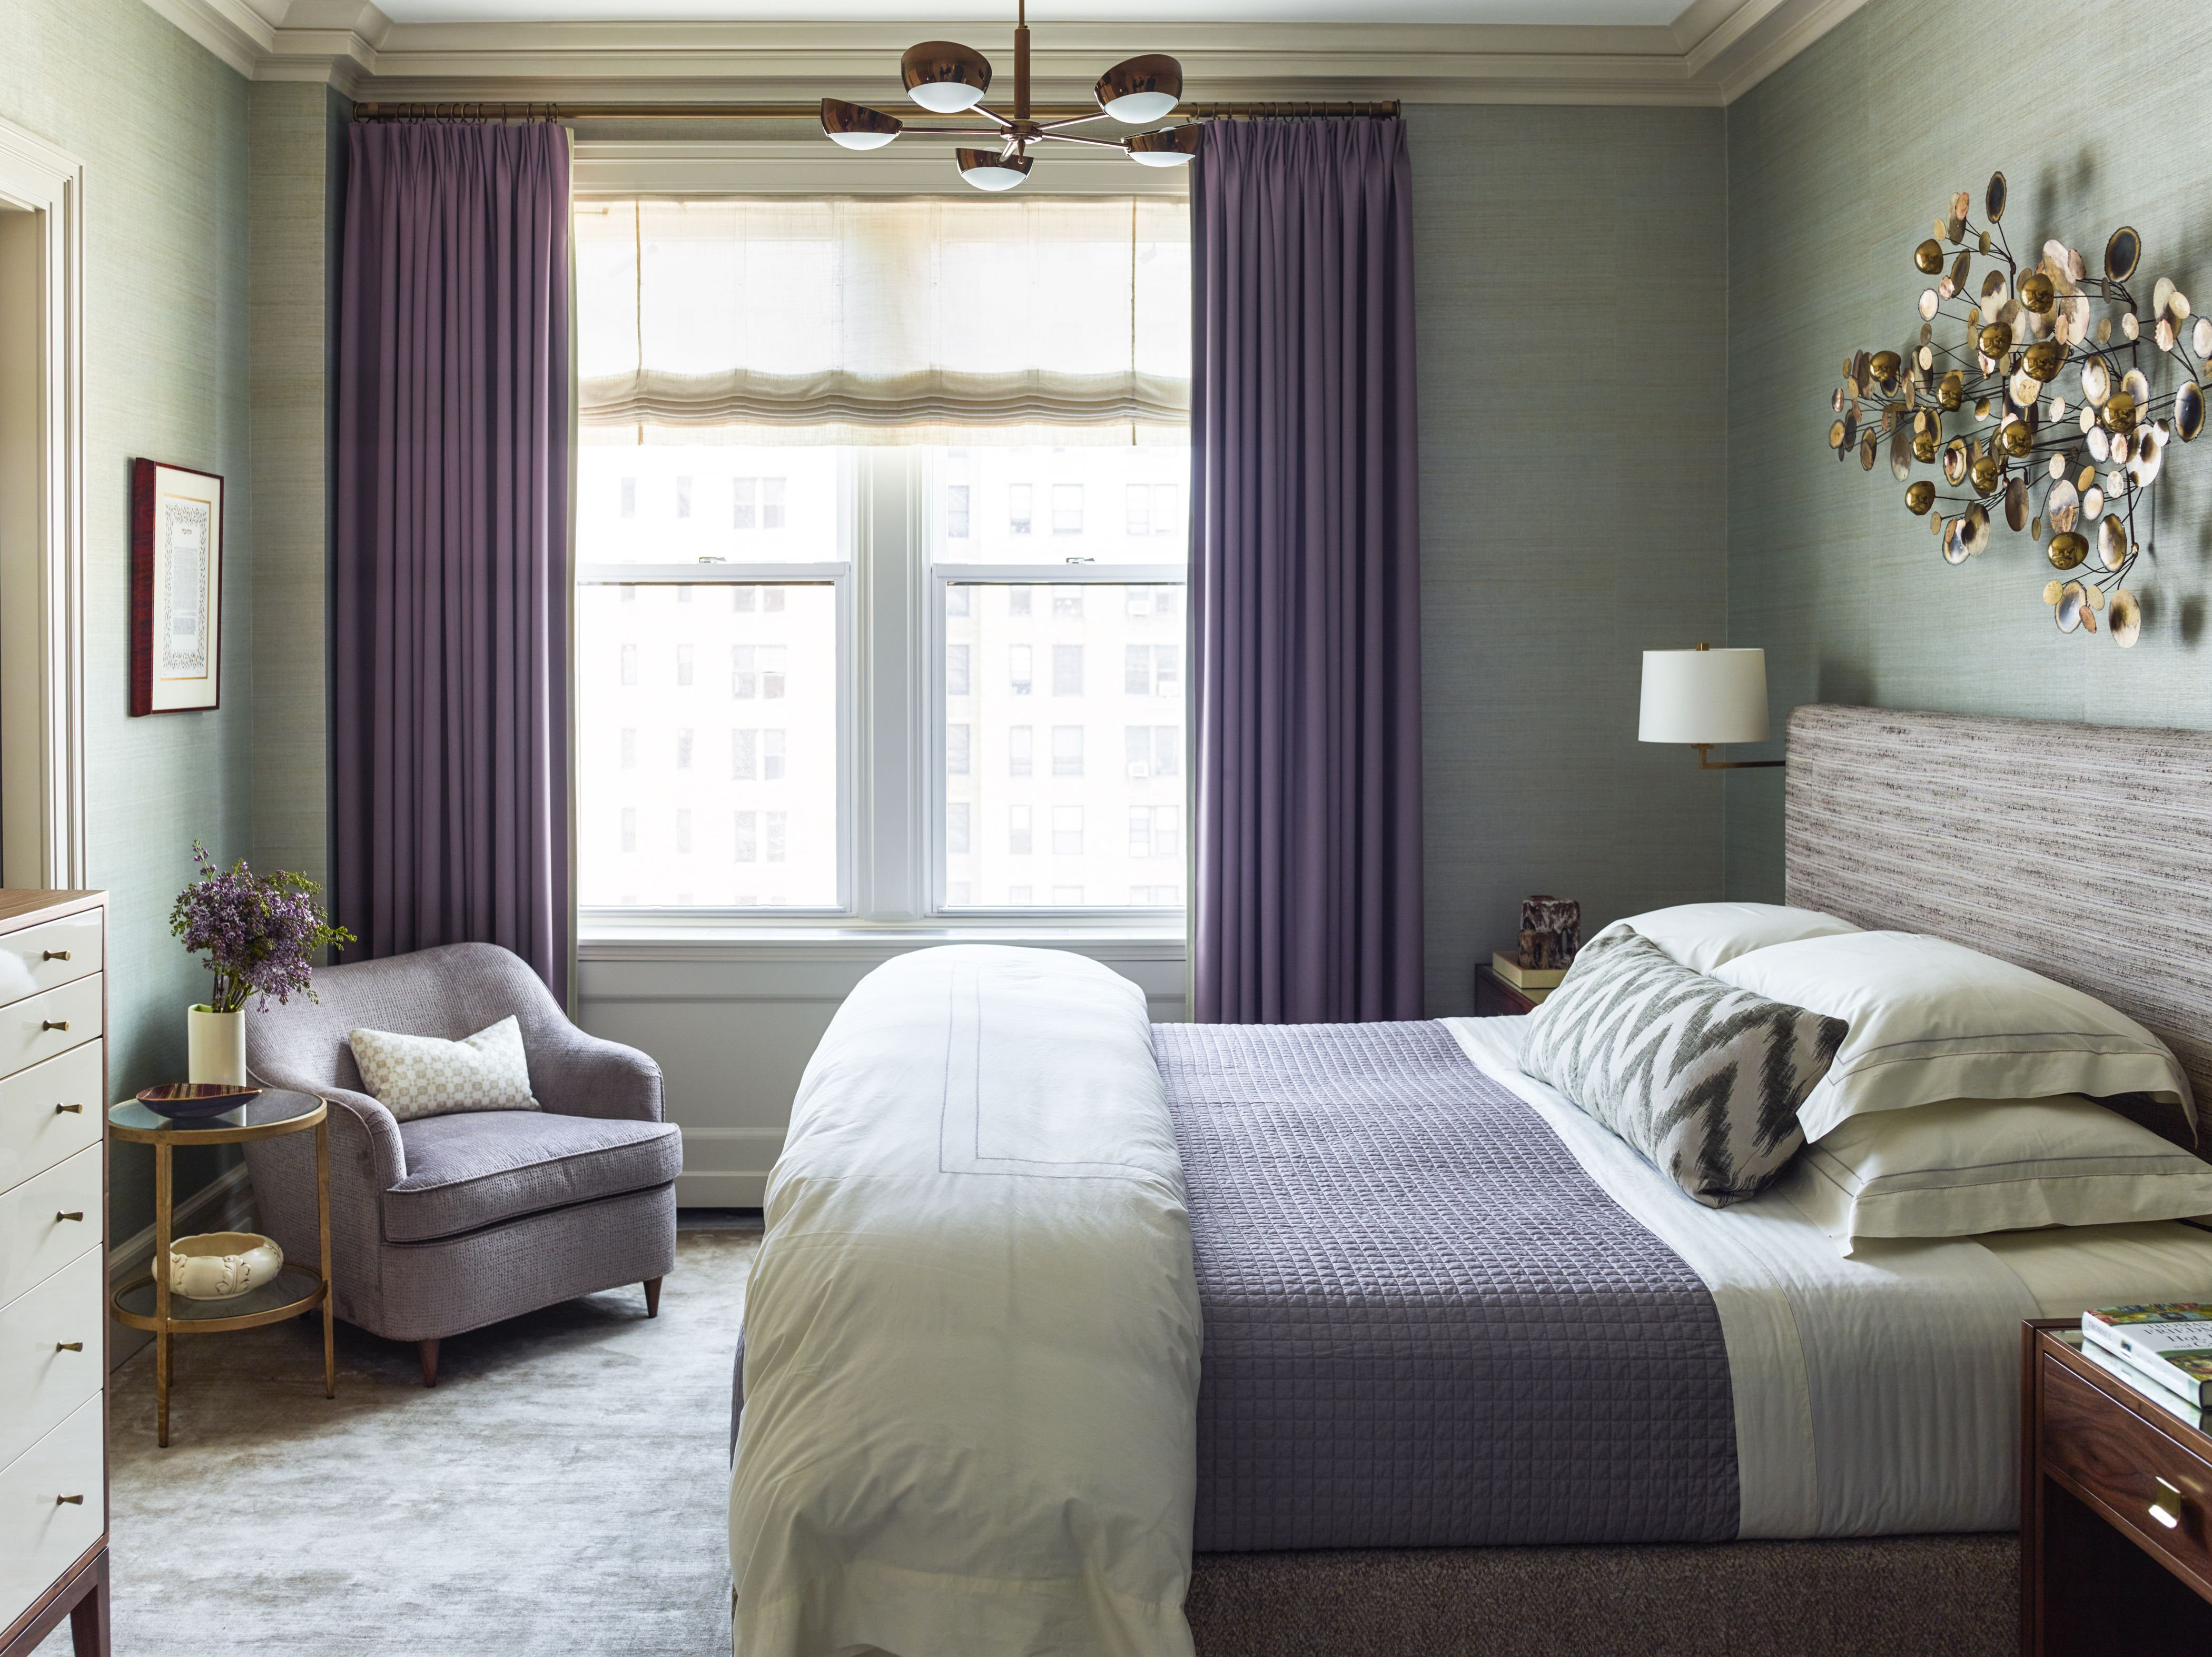 Upper West Side Bedroom | Bedroom Ideas | Design ...